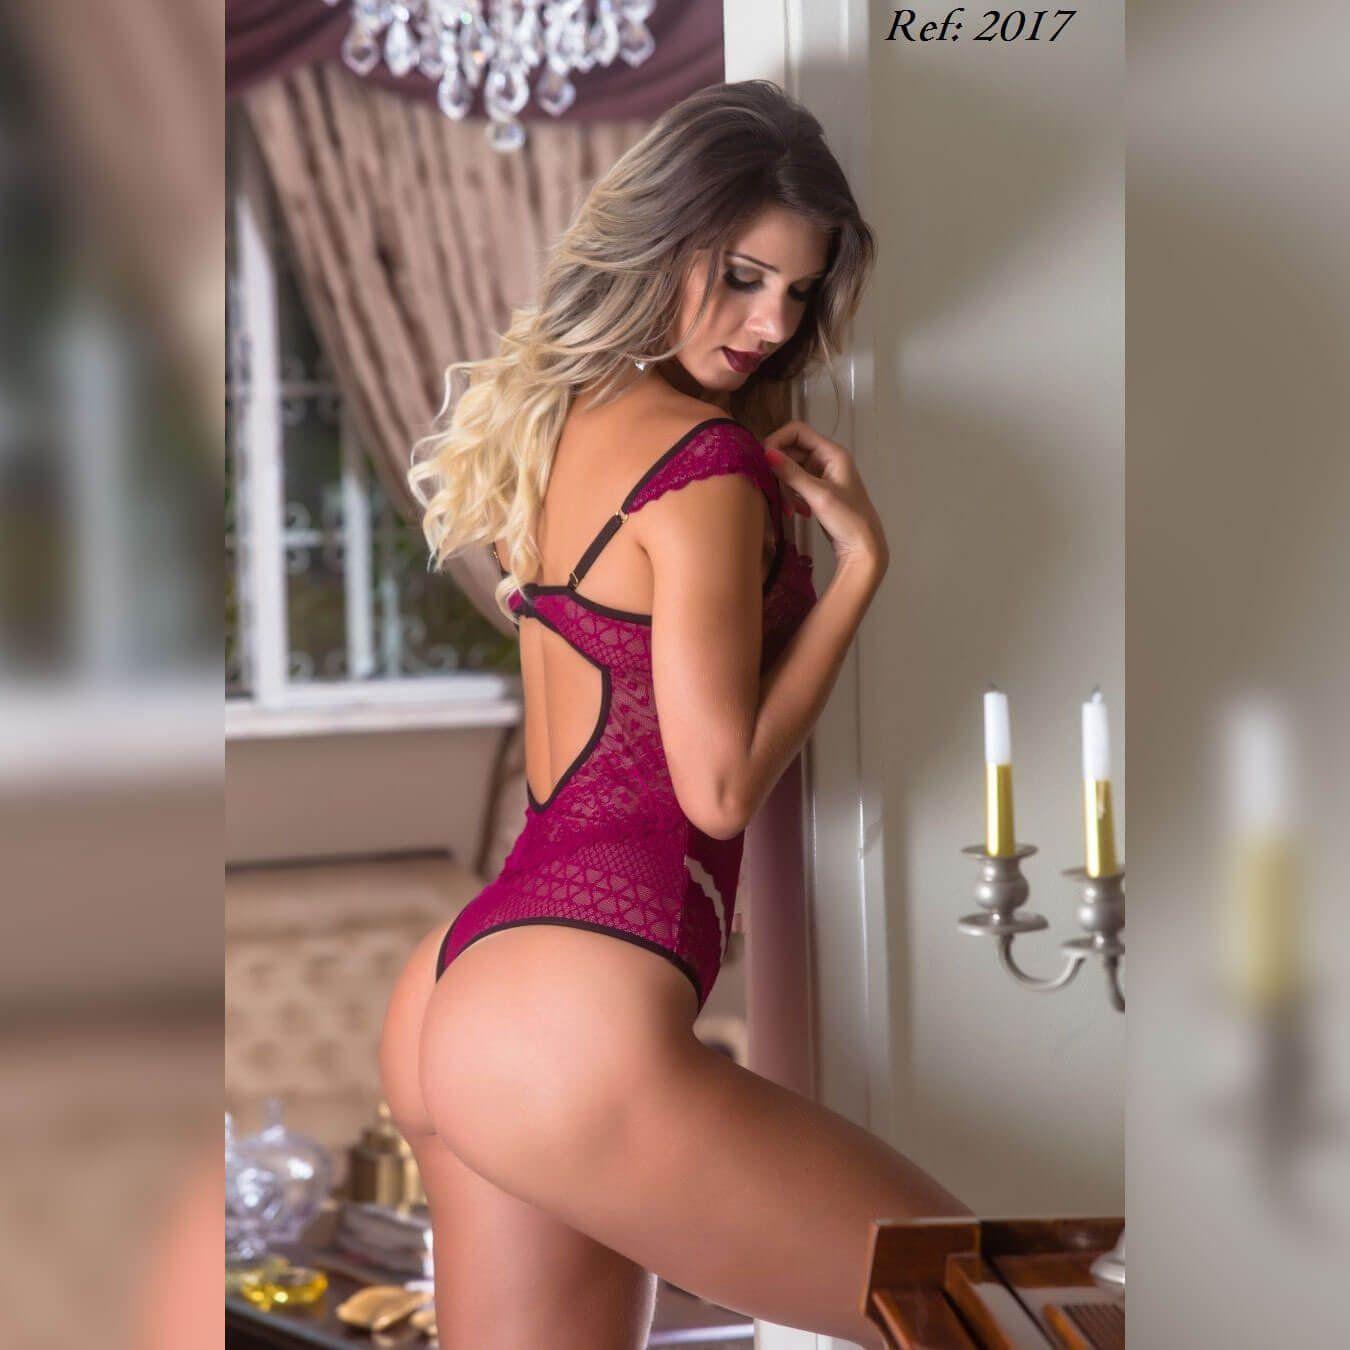 Body Marianni - Lingerie garota veneno  - Sex Shop Cuiaba - Sexshop - Sexyshop - Produtos Eróticos